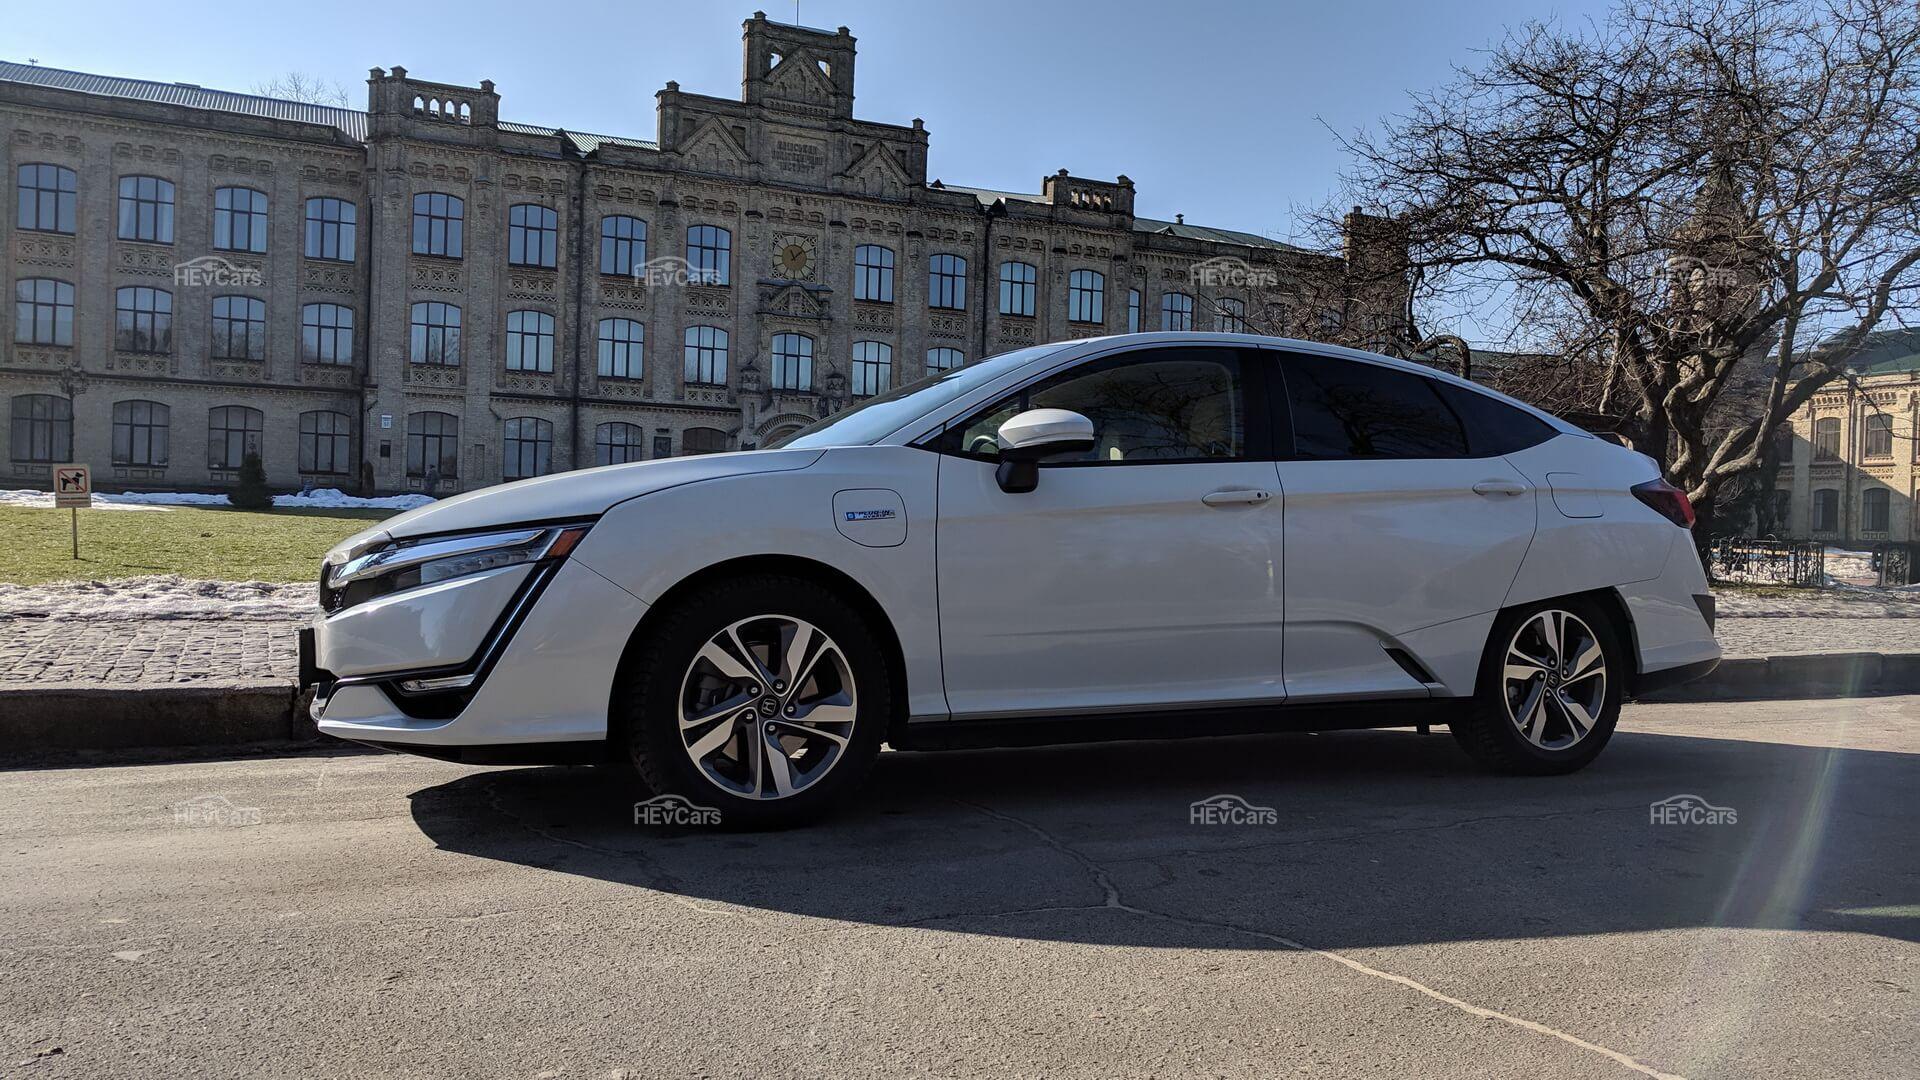 Плагин-гибрид Honda Clarity